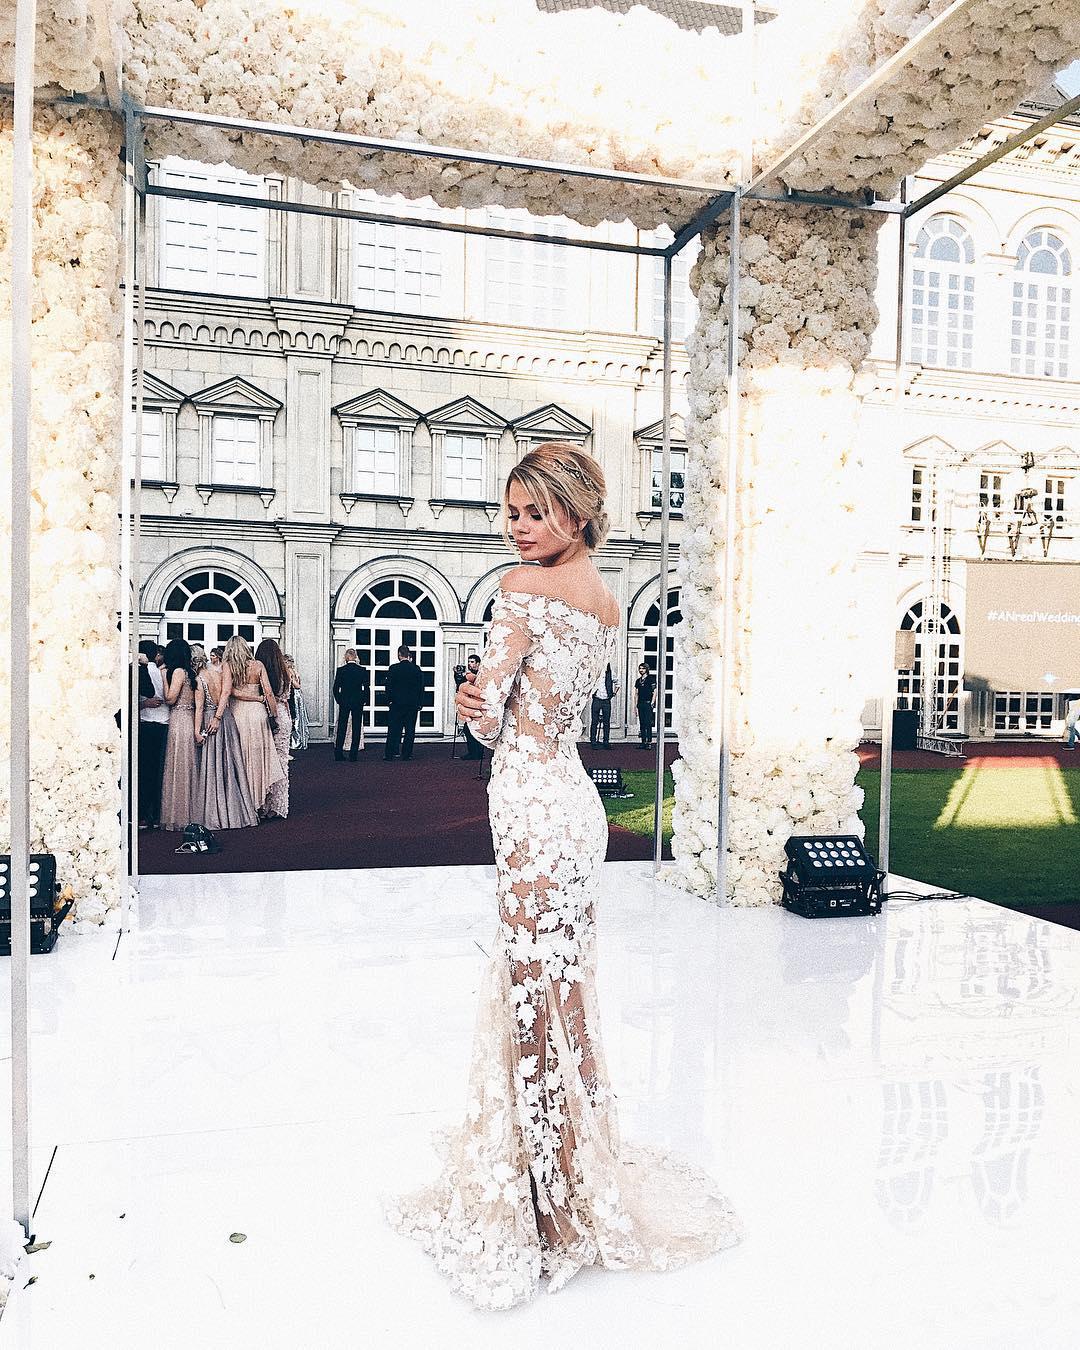 A luxurious wedding of grandson Alla Pugacheva turned into a scandal 17.08.2017 73